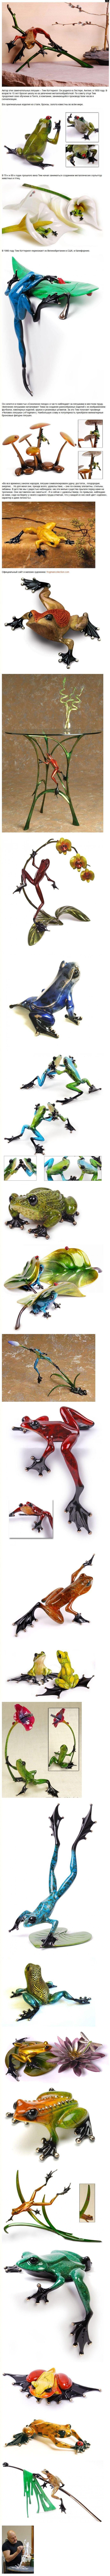 Царевны-лягушки.